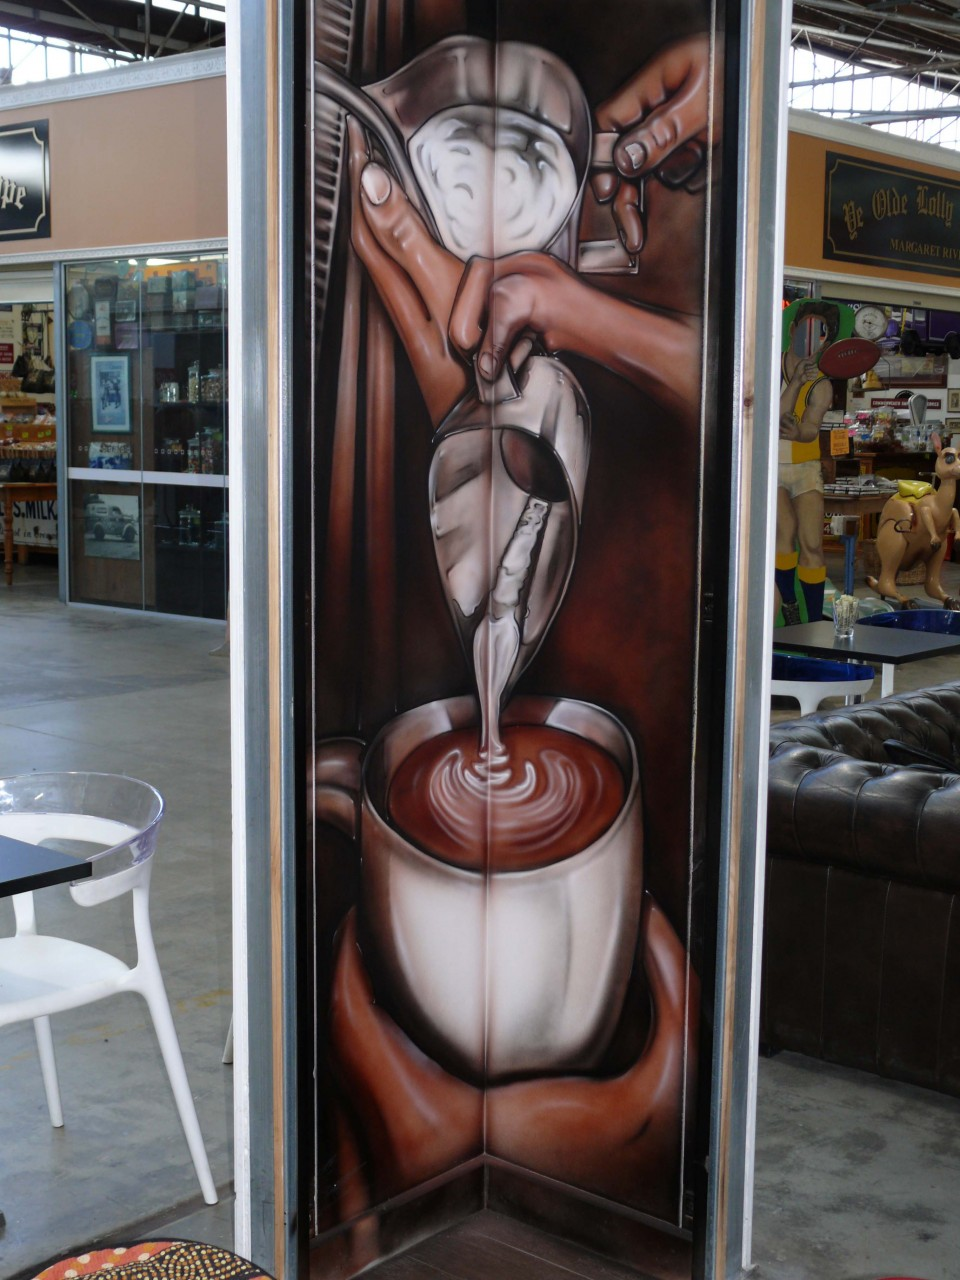 airbrush art-airbrush art perth-airbrush perth-airbrush murals-airbrush signs-signs-airbrush graphics-Kaldi Cafe6